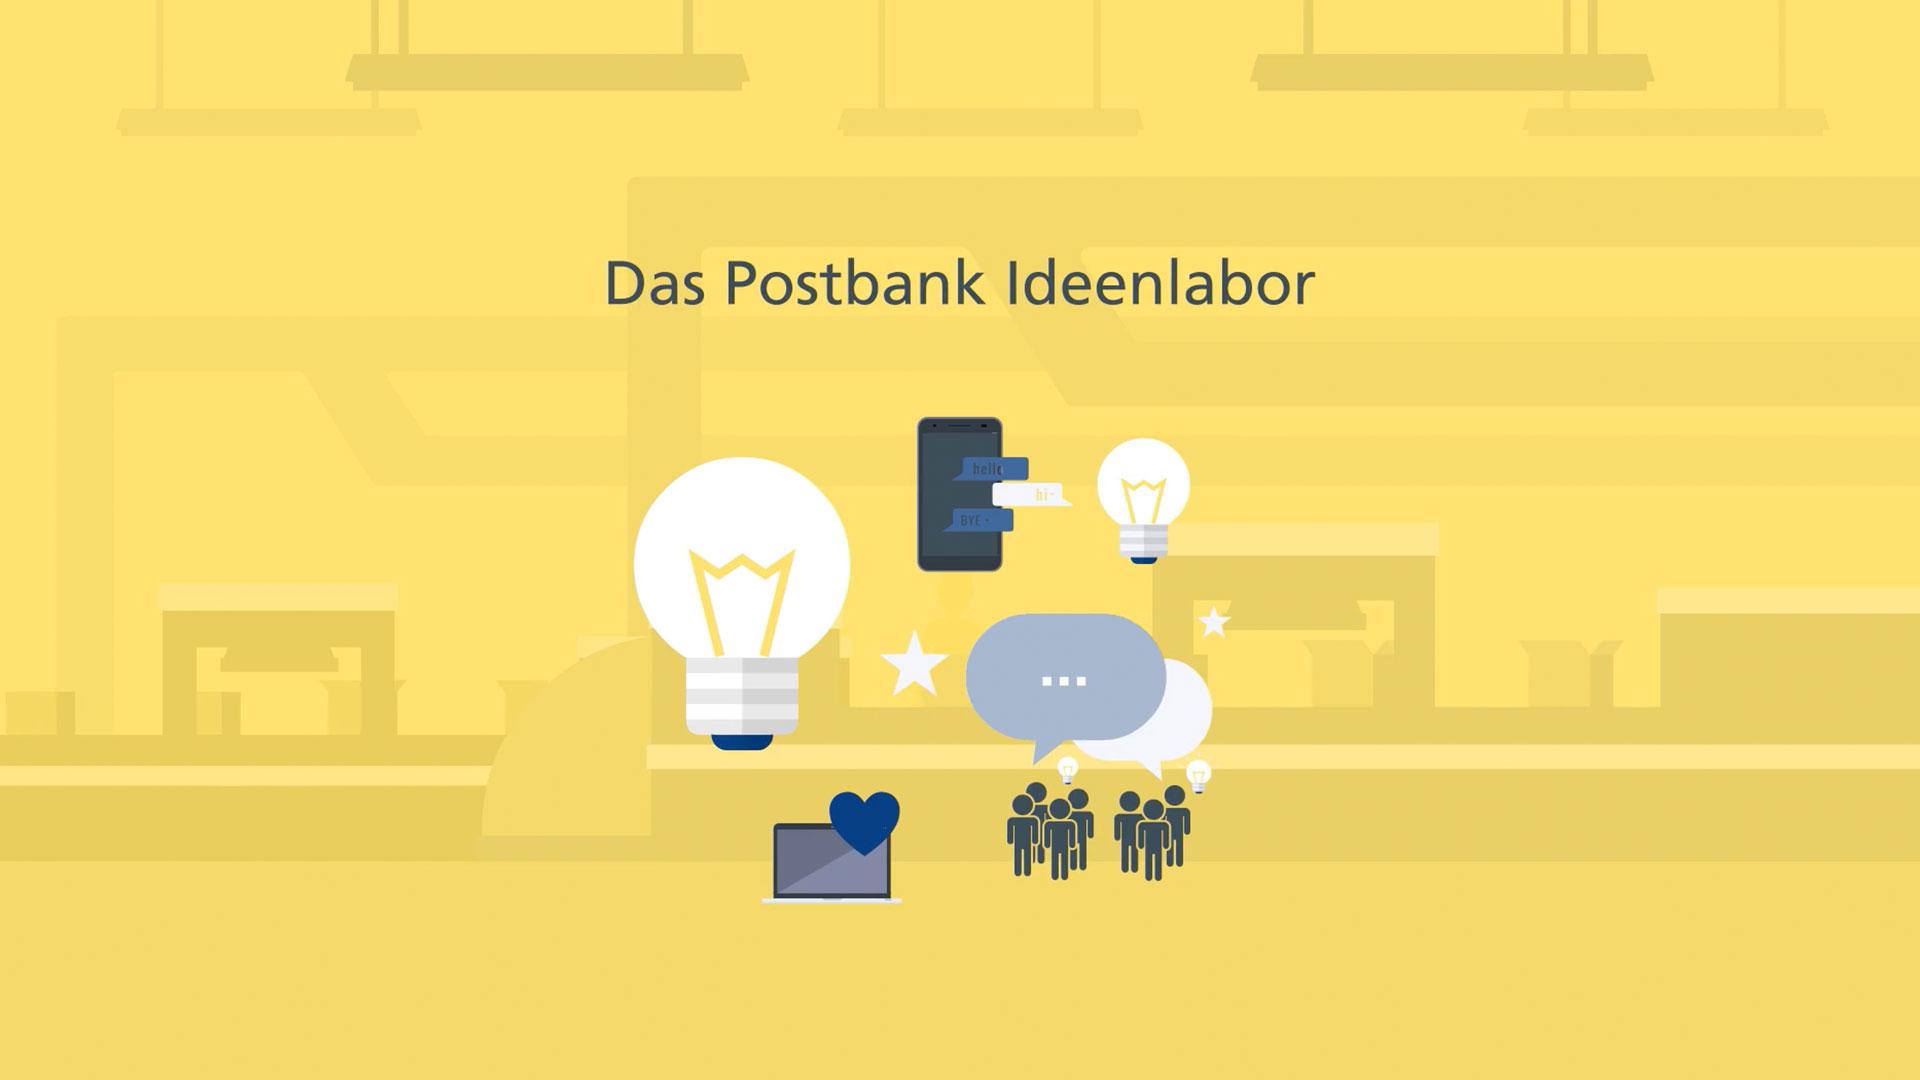 postbank-themenwelten-ideenlabor-video-1920x1080.jpg